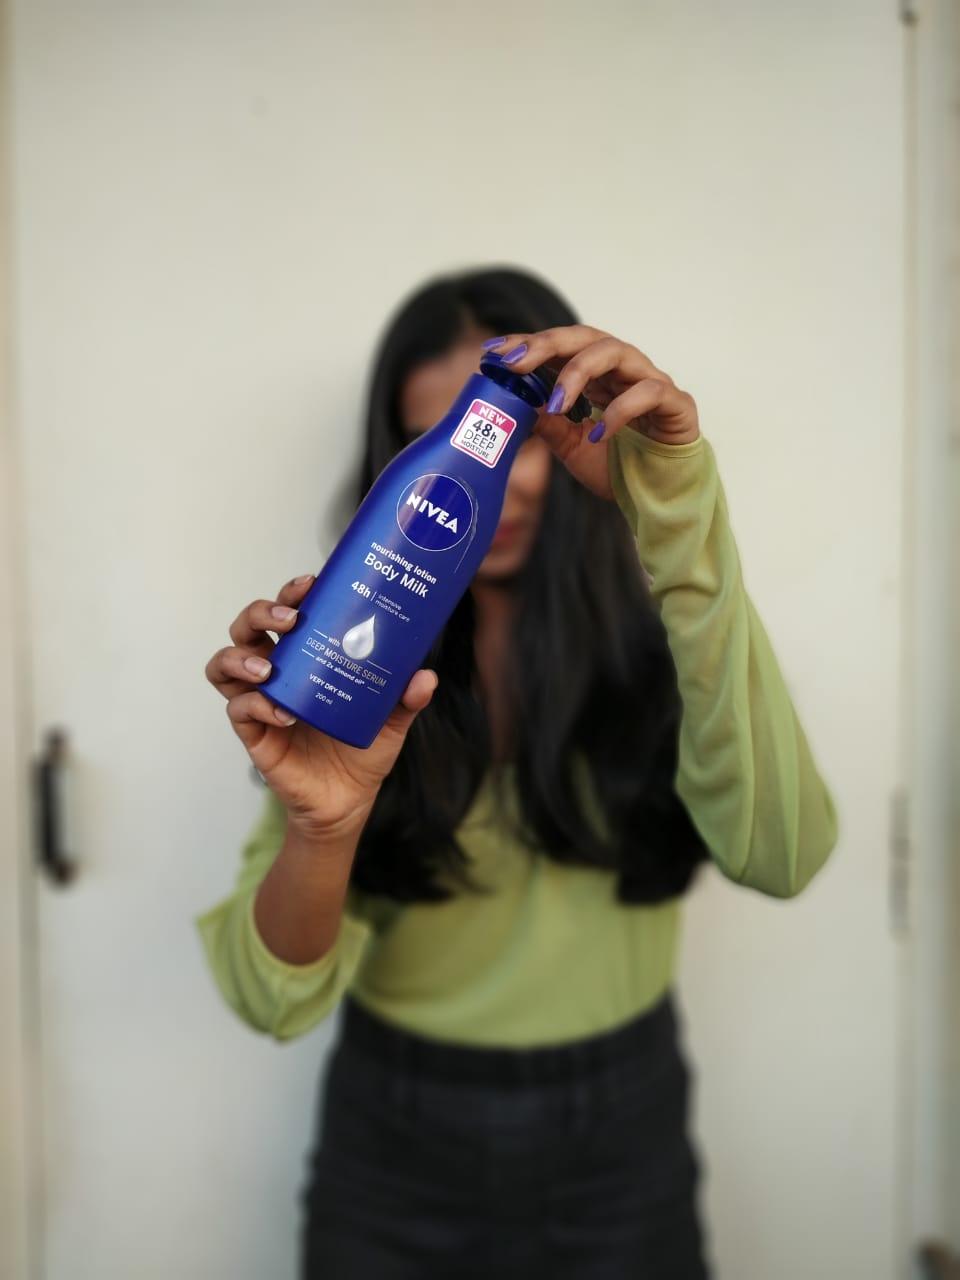 Nivea Nourishing Lotion Body Milk with Deep Moisture Serum -Nivea moisturising lotion-By nidhiprakash12